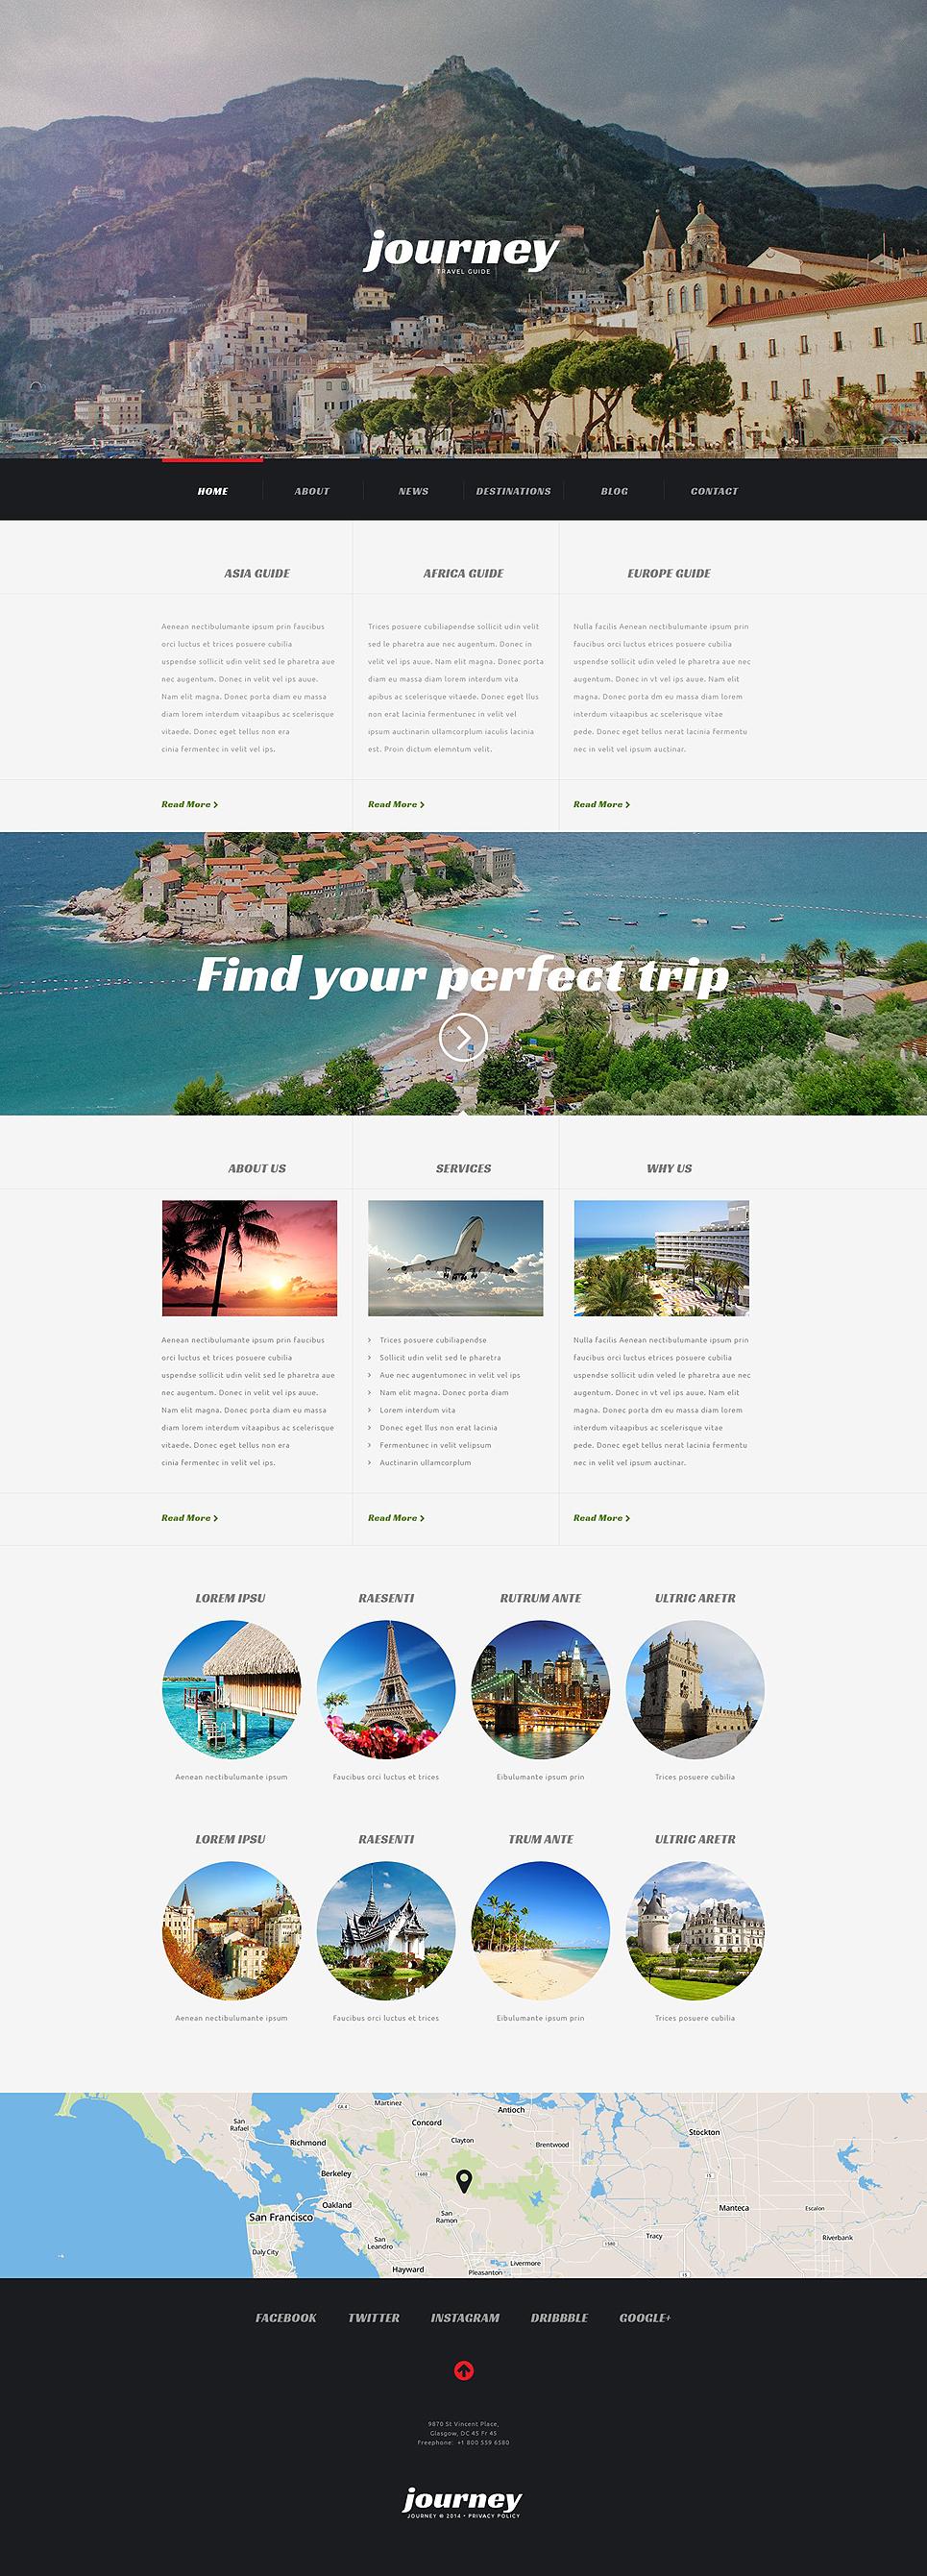 Адаптивный шаблон сайта на тему агентство путешествий #54044